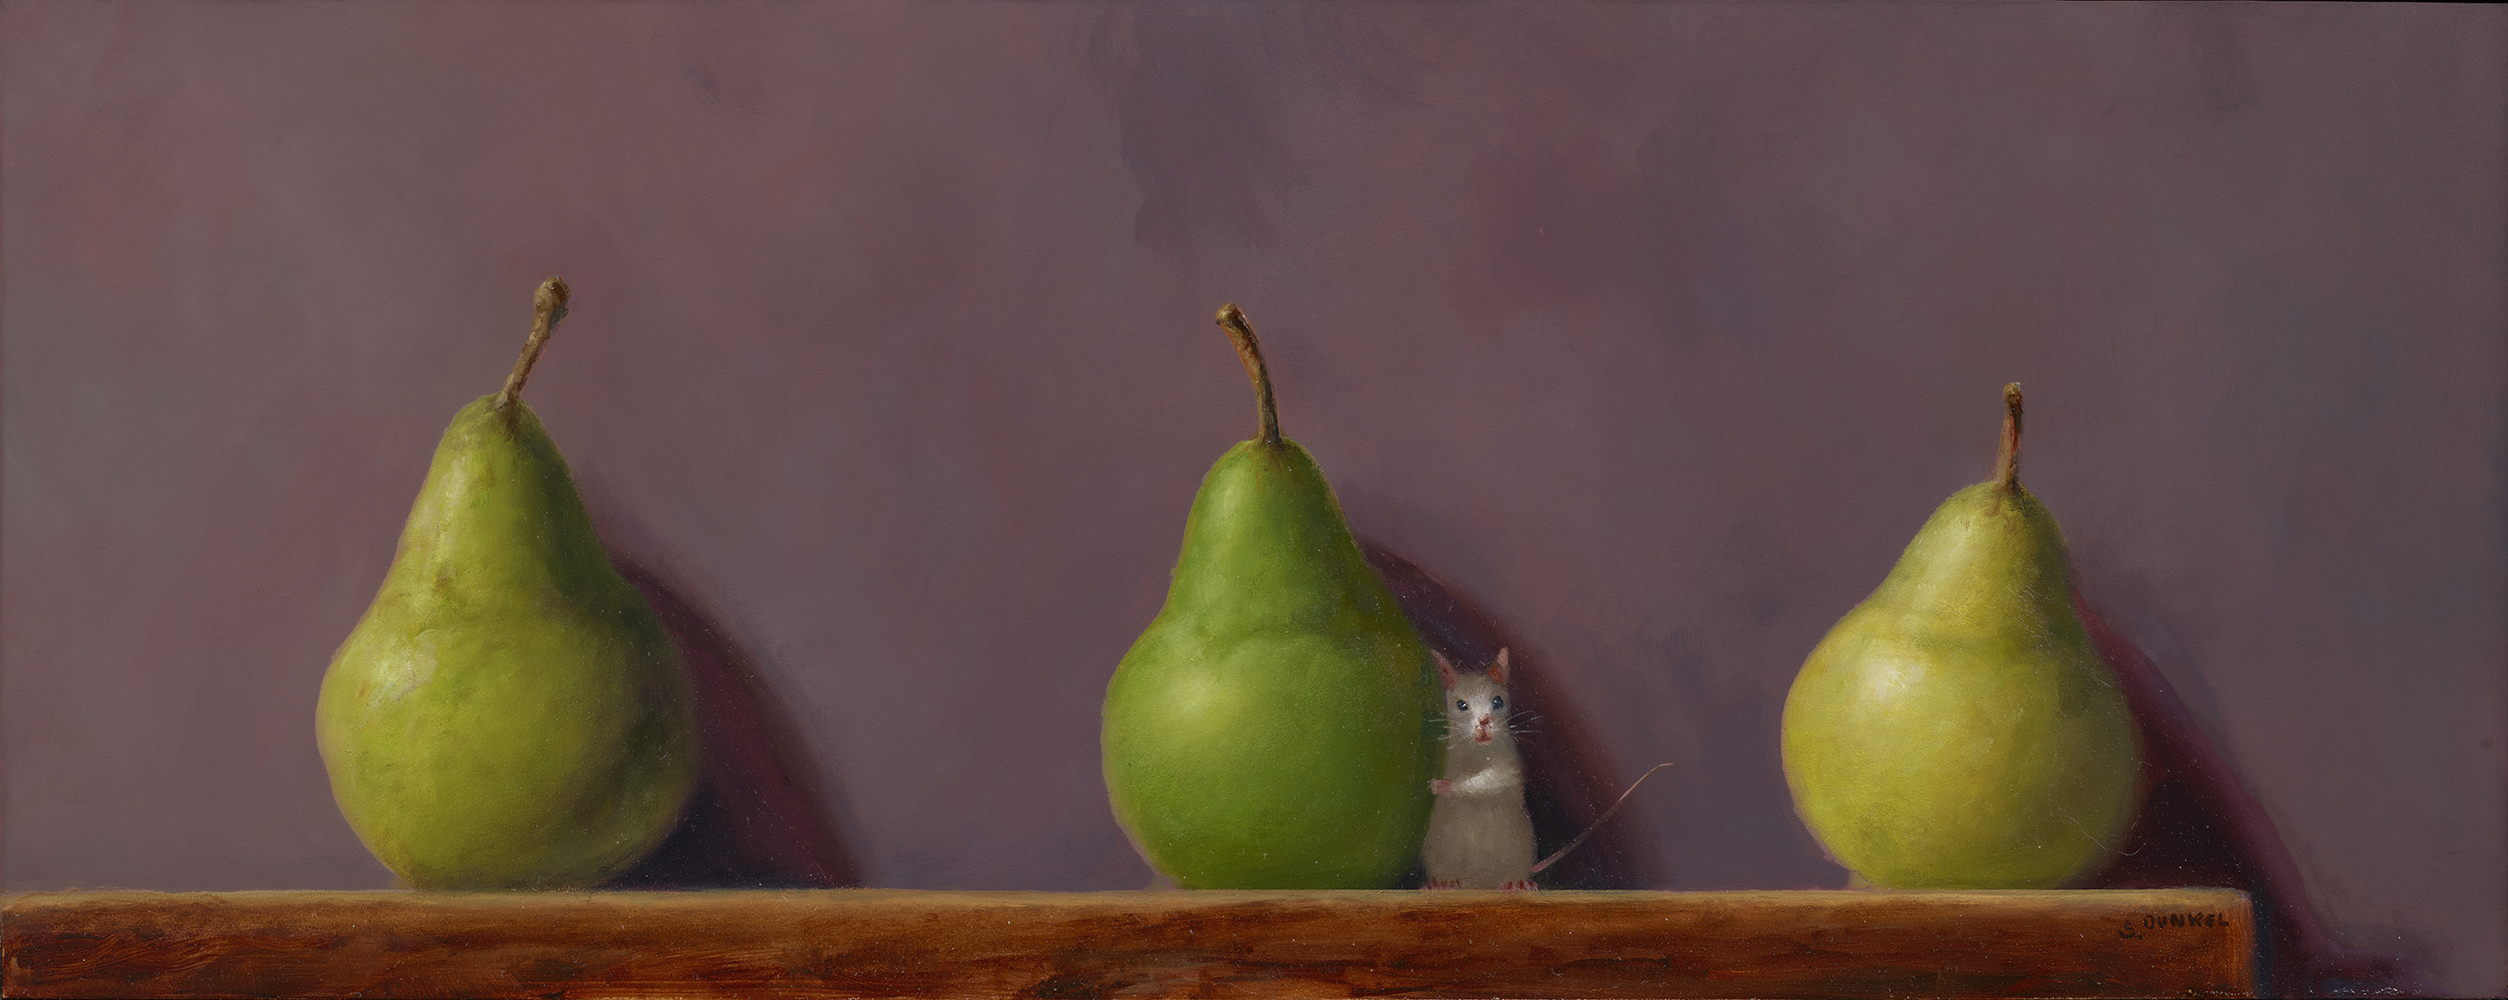 stuart_dunkel_sd1328_three_pears.jpg